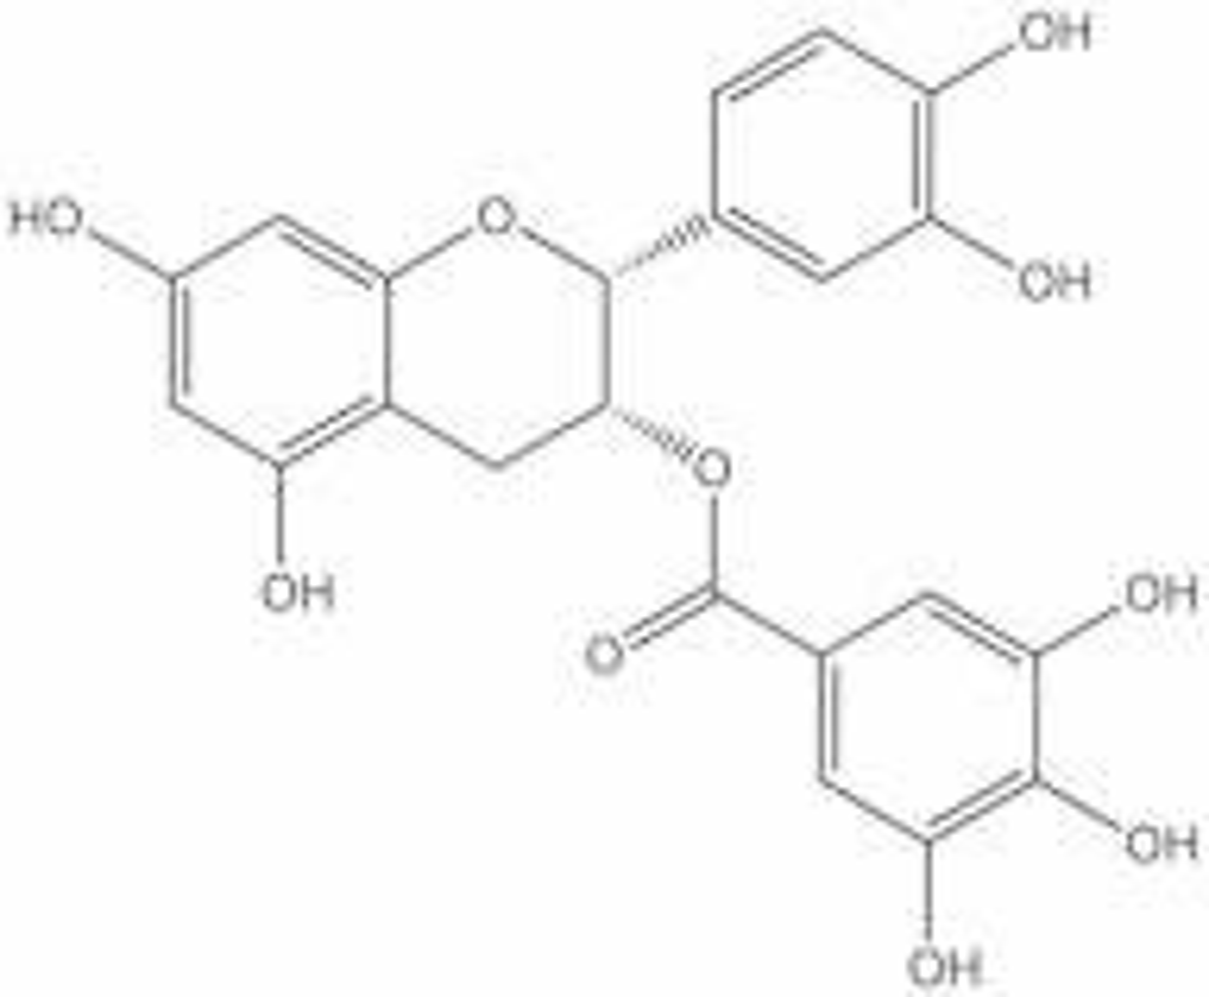 (-)-epicatechin 3-gallate